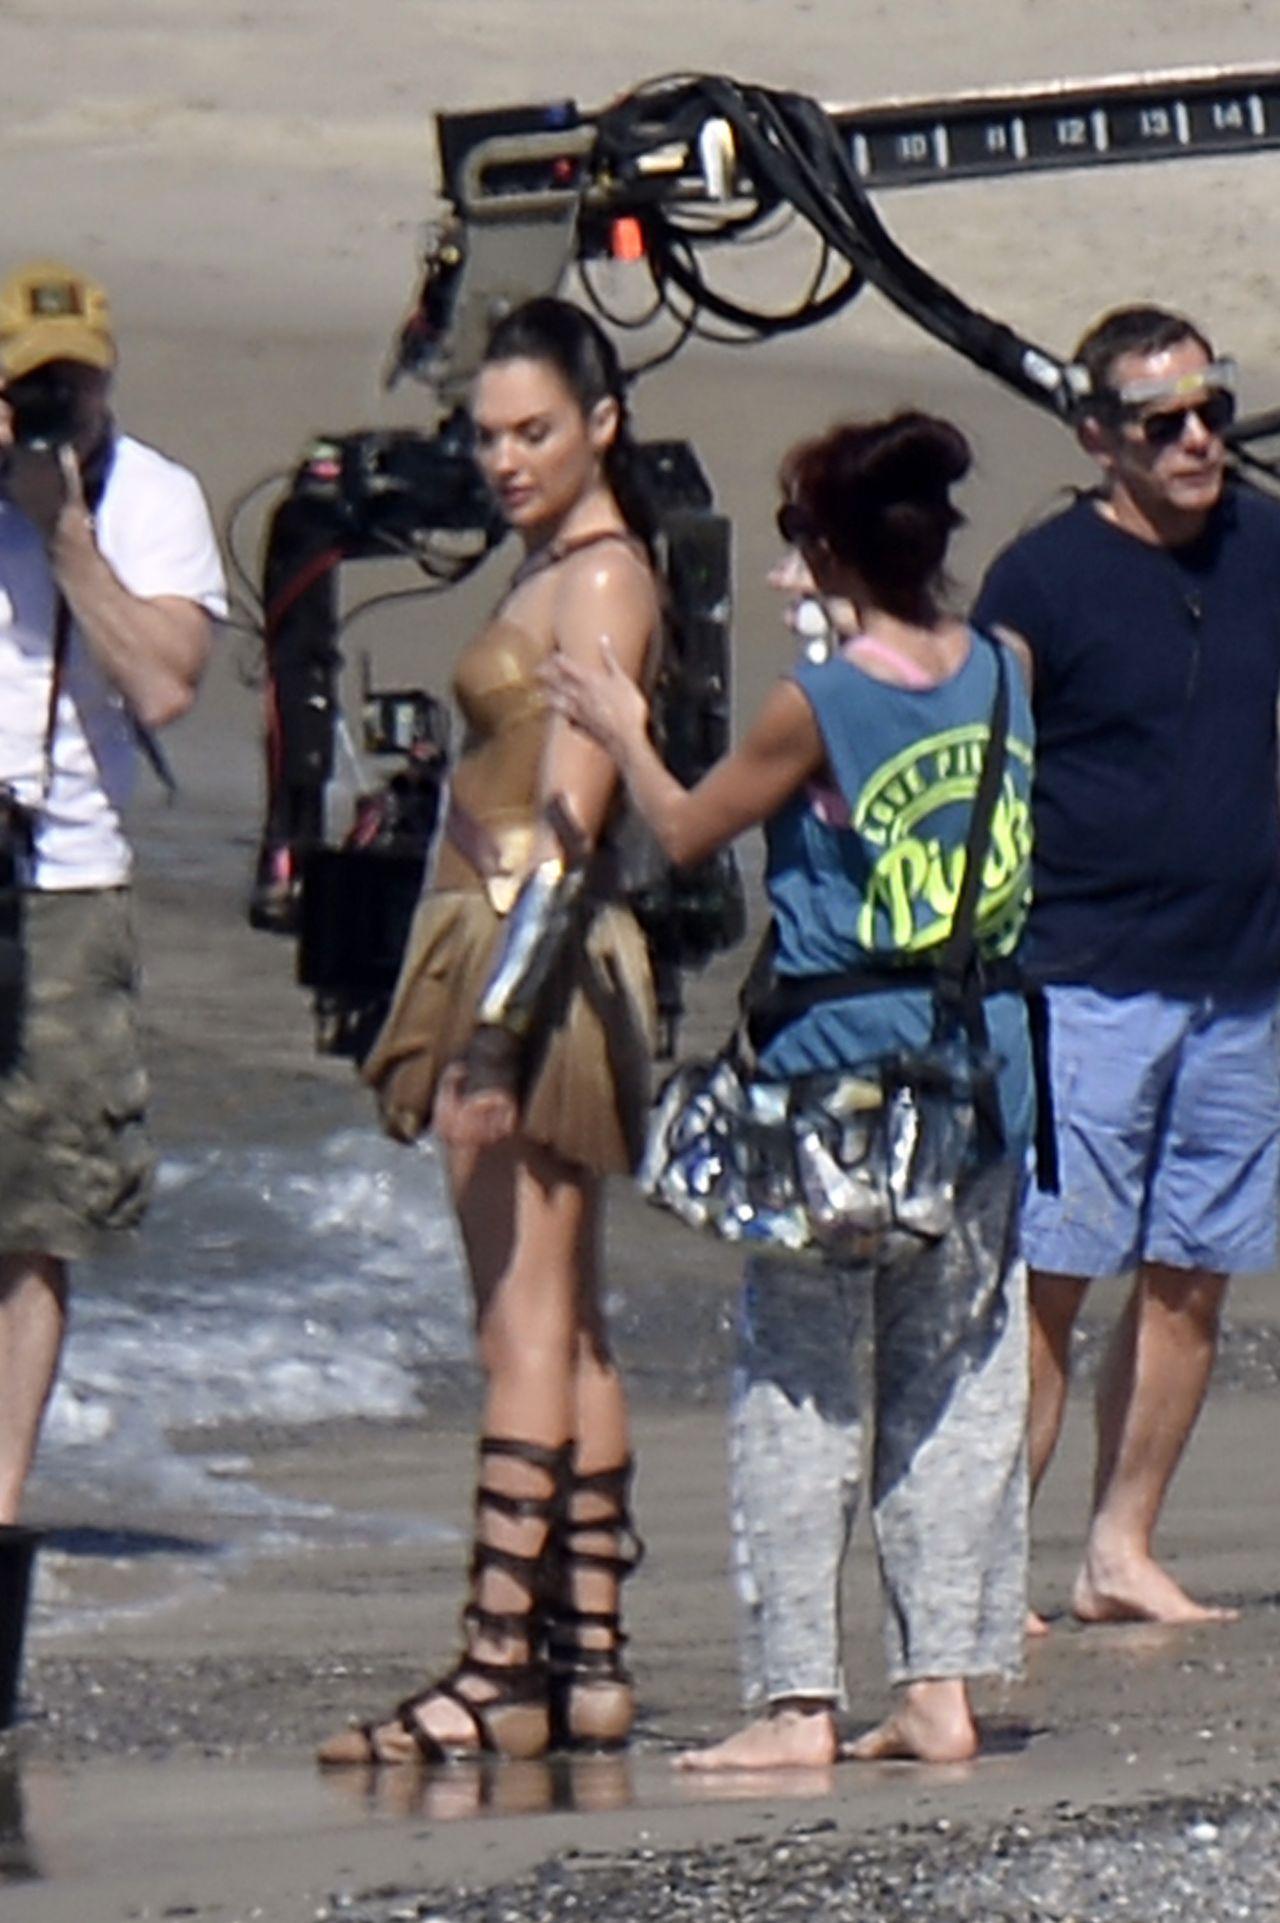 Isla fisher sexy scene on scandalplanetcom - 4 6